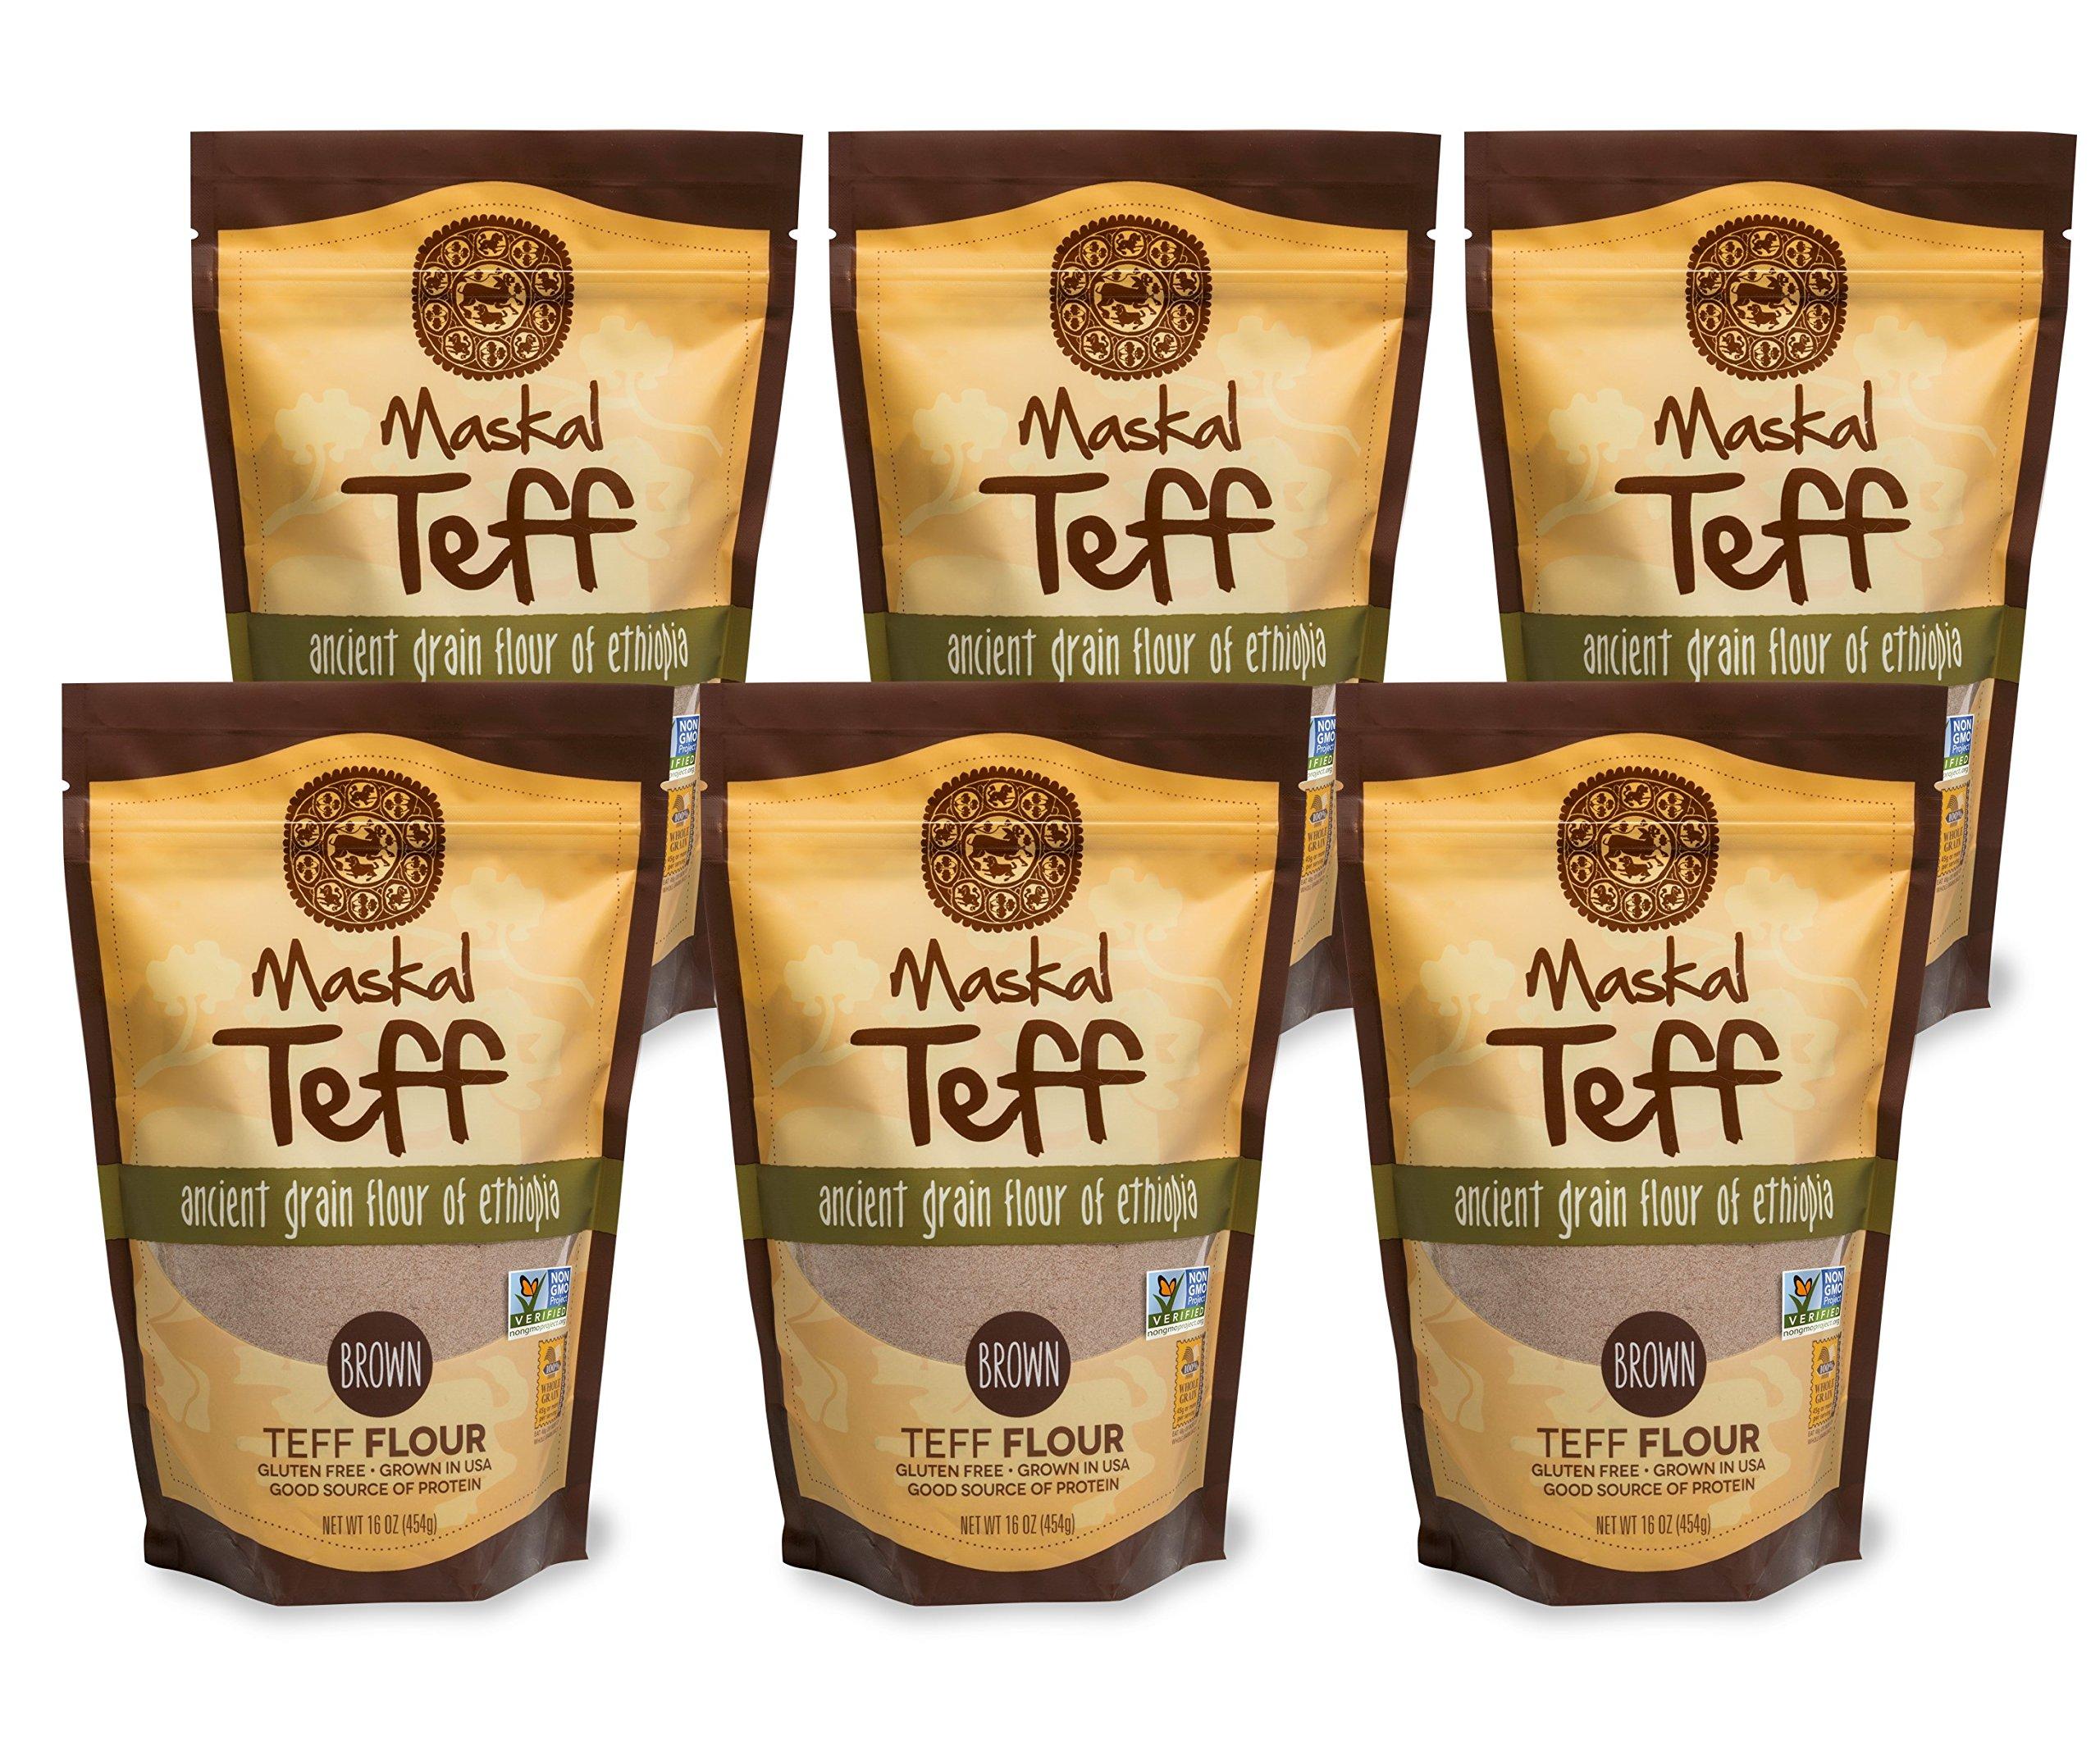 Amazon.com : Maskal Teff Ivory Teff Flour, 16 Ounce (6